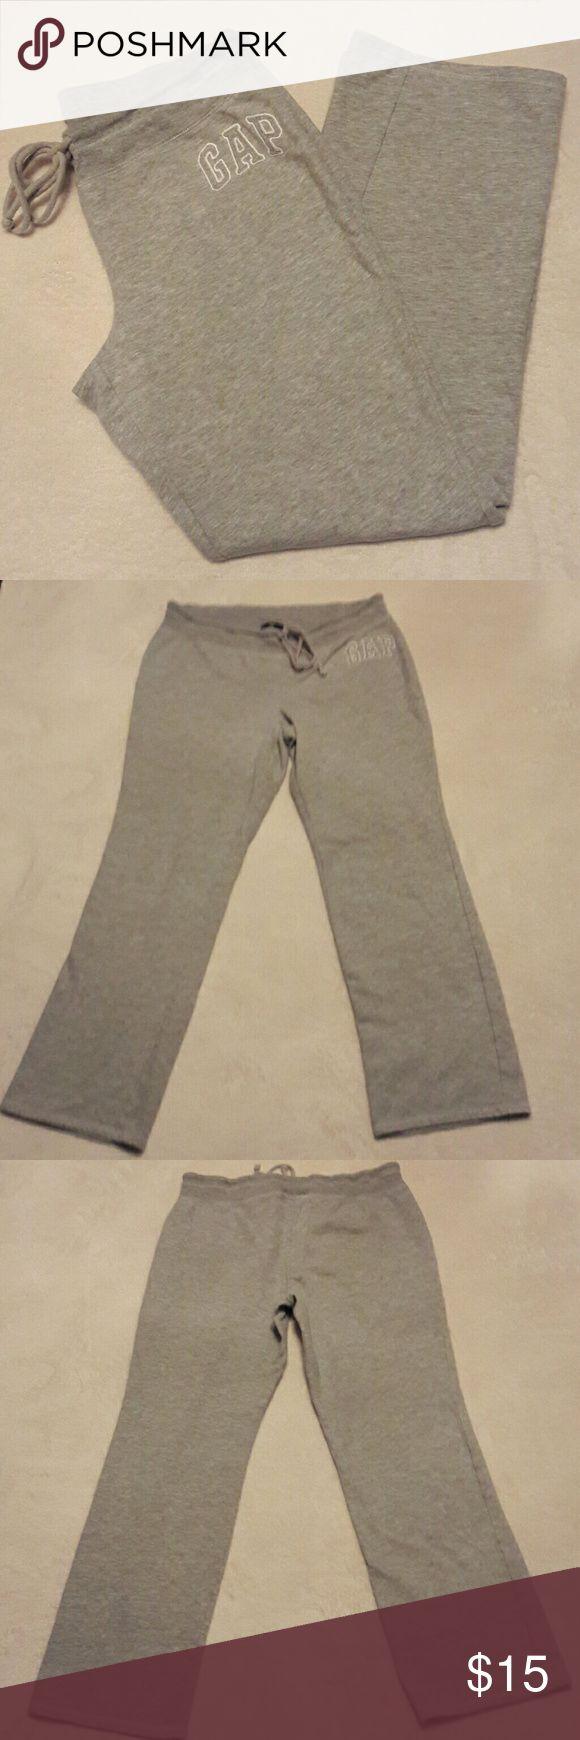 GAP fleece pants Women's GAP bootcut fleece pants GAP Pants